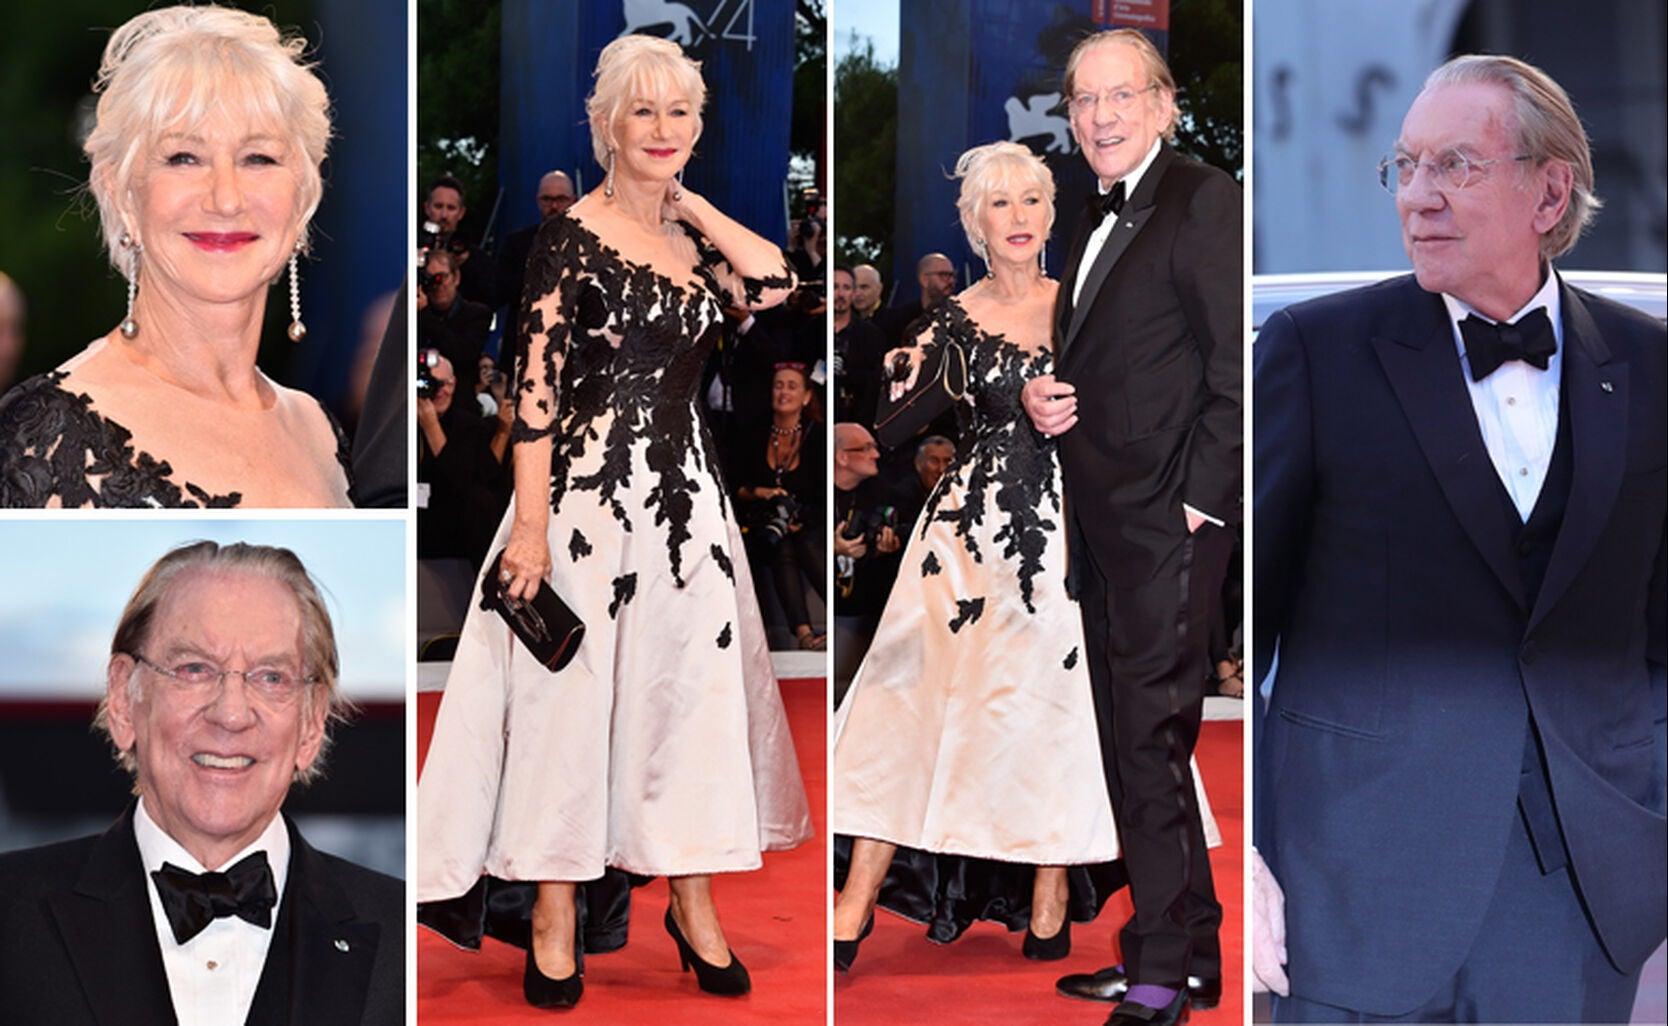 Helen Mirren and Donald Sutherland